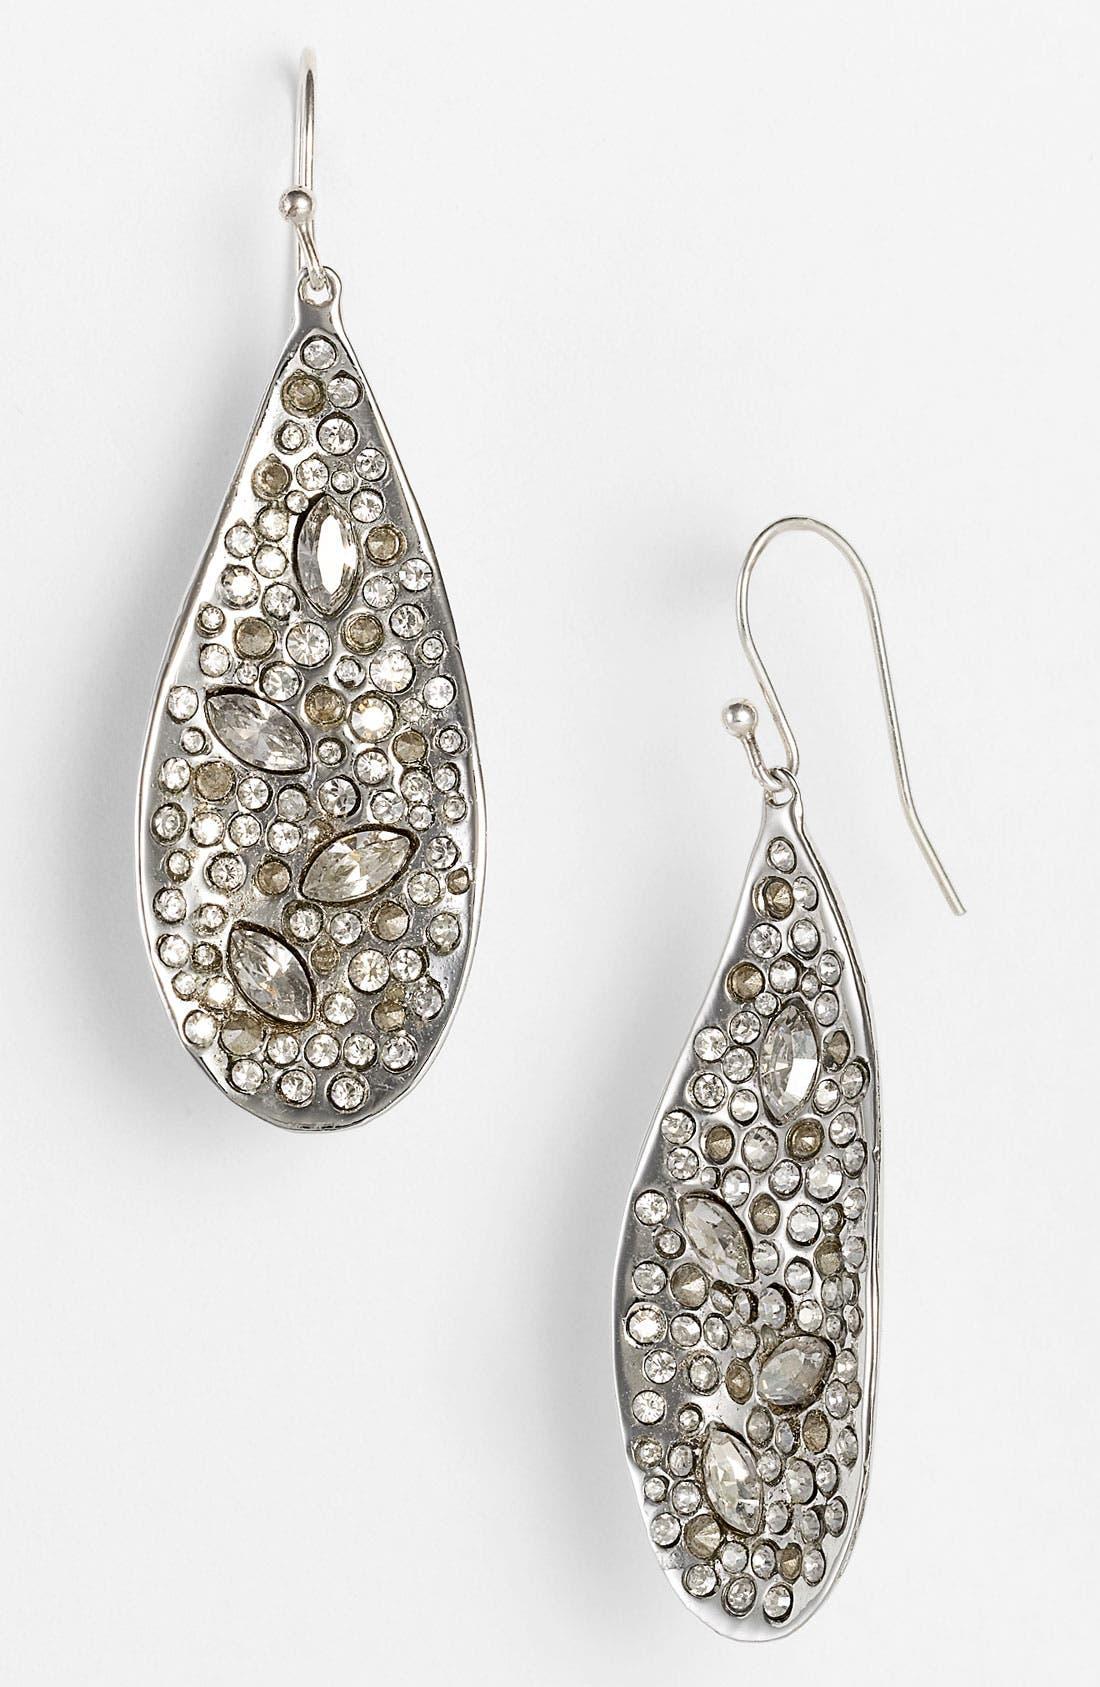 Alternate Image 1 Selected - Alexis Bittar 'Miss Havisham' Large Teardrop Earrings